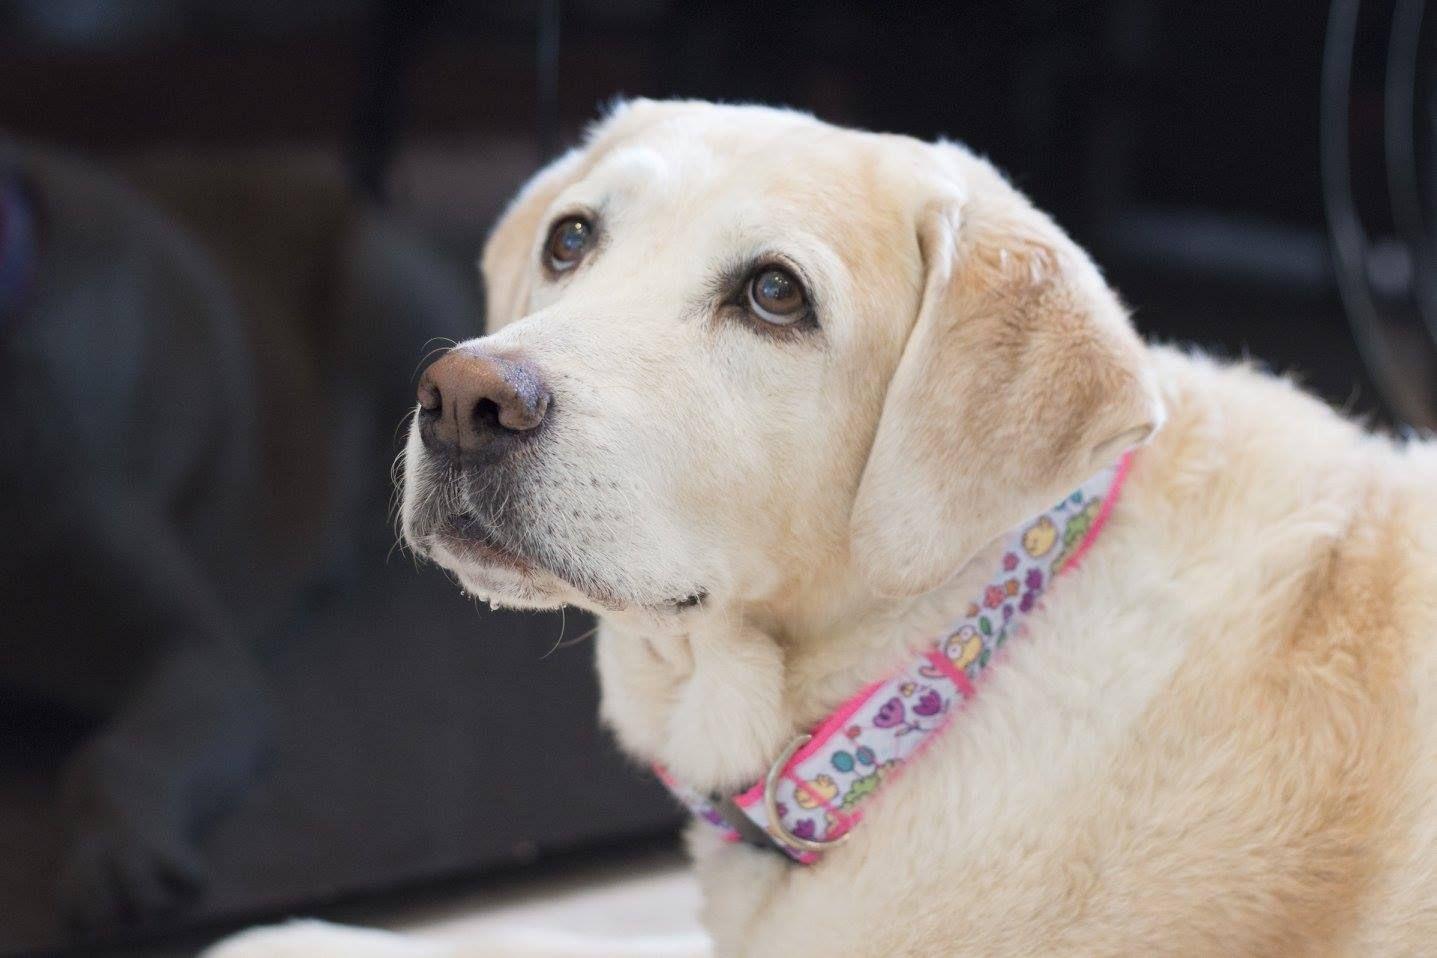 Our Best Selling Collar Buy Here Http Www Headsupfortails Com Huft Tweet Tweet Dog Collar Html Our Pretty Tweet Tweet D Online Pet Supplies Buy Pets Dogs